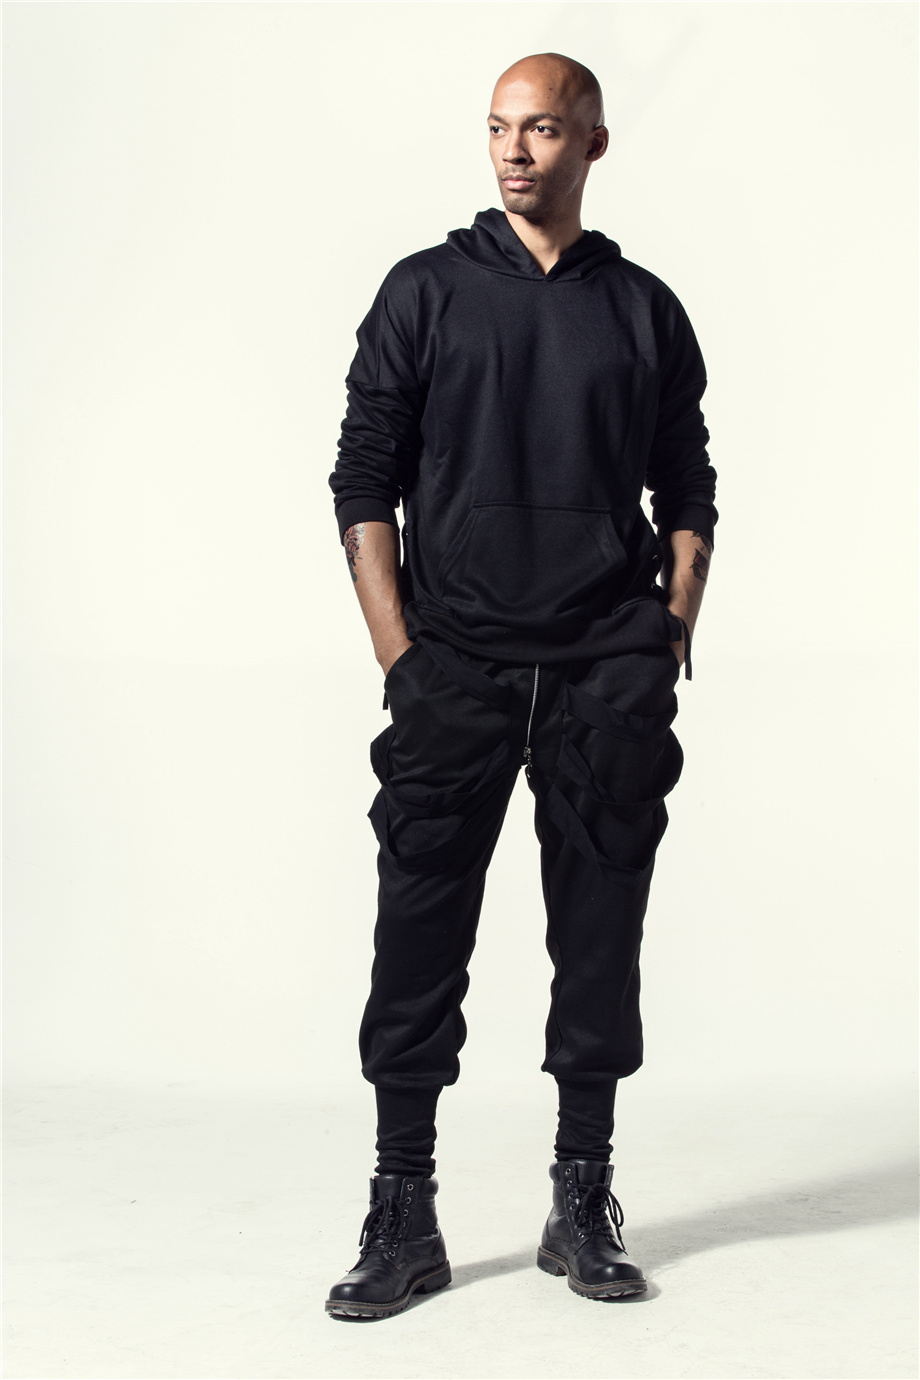 Una Reta Brand New Design Hoodie Men Fashion Sweatshirts Bandage Design Hip-Hop Style Plus Size M-5XL Pullover Sweatshirts Men 7